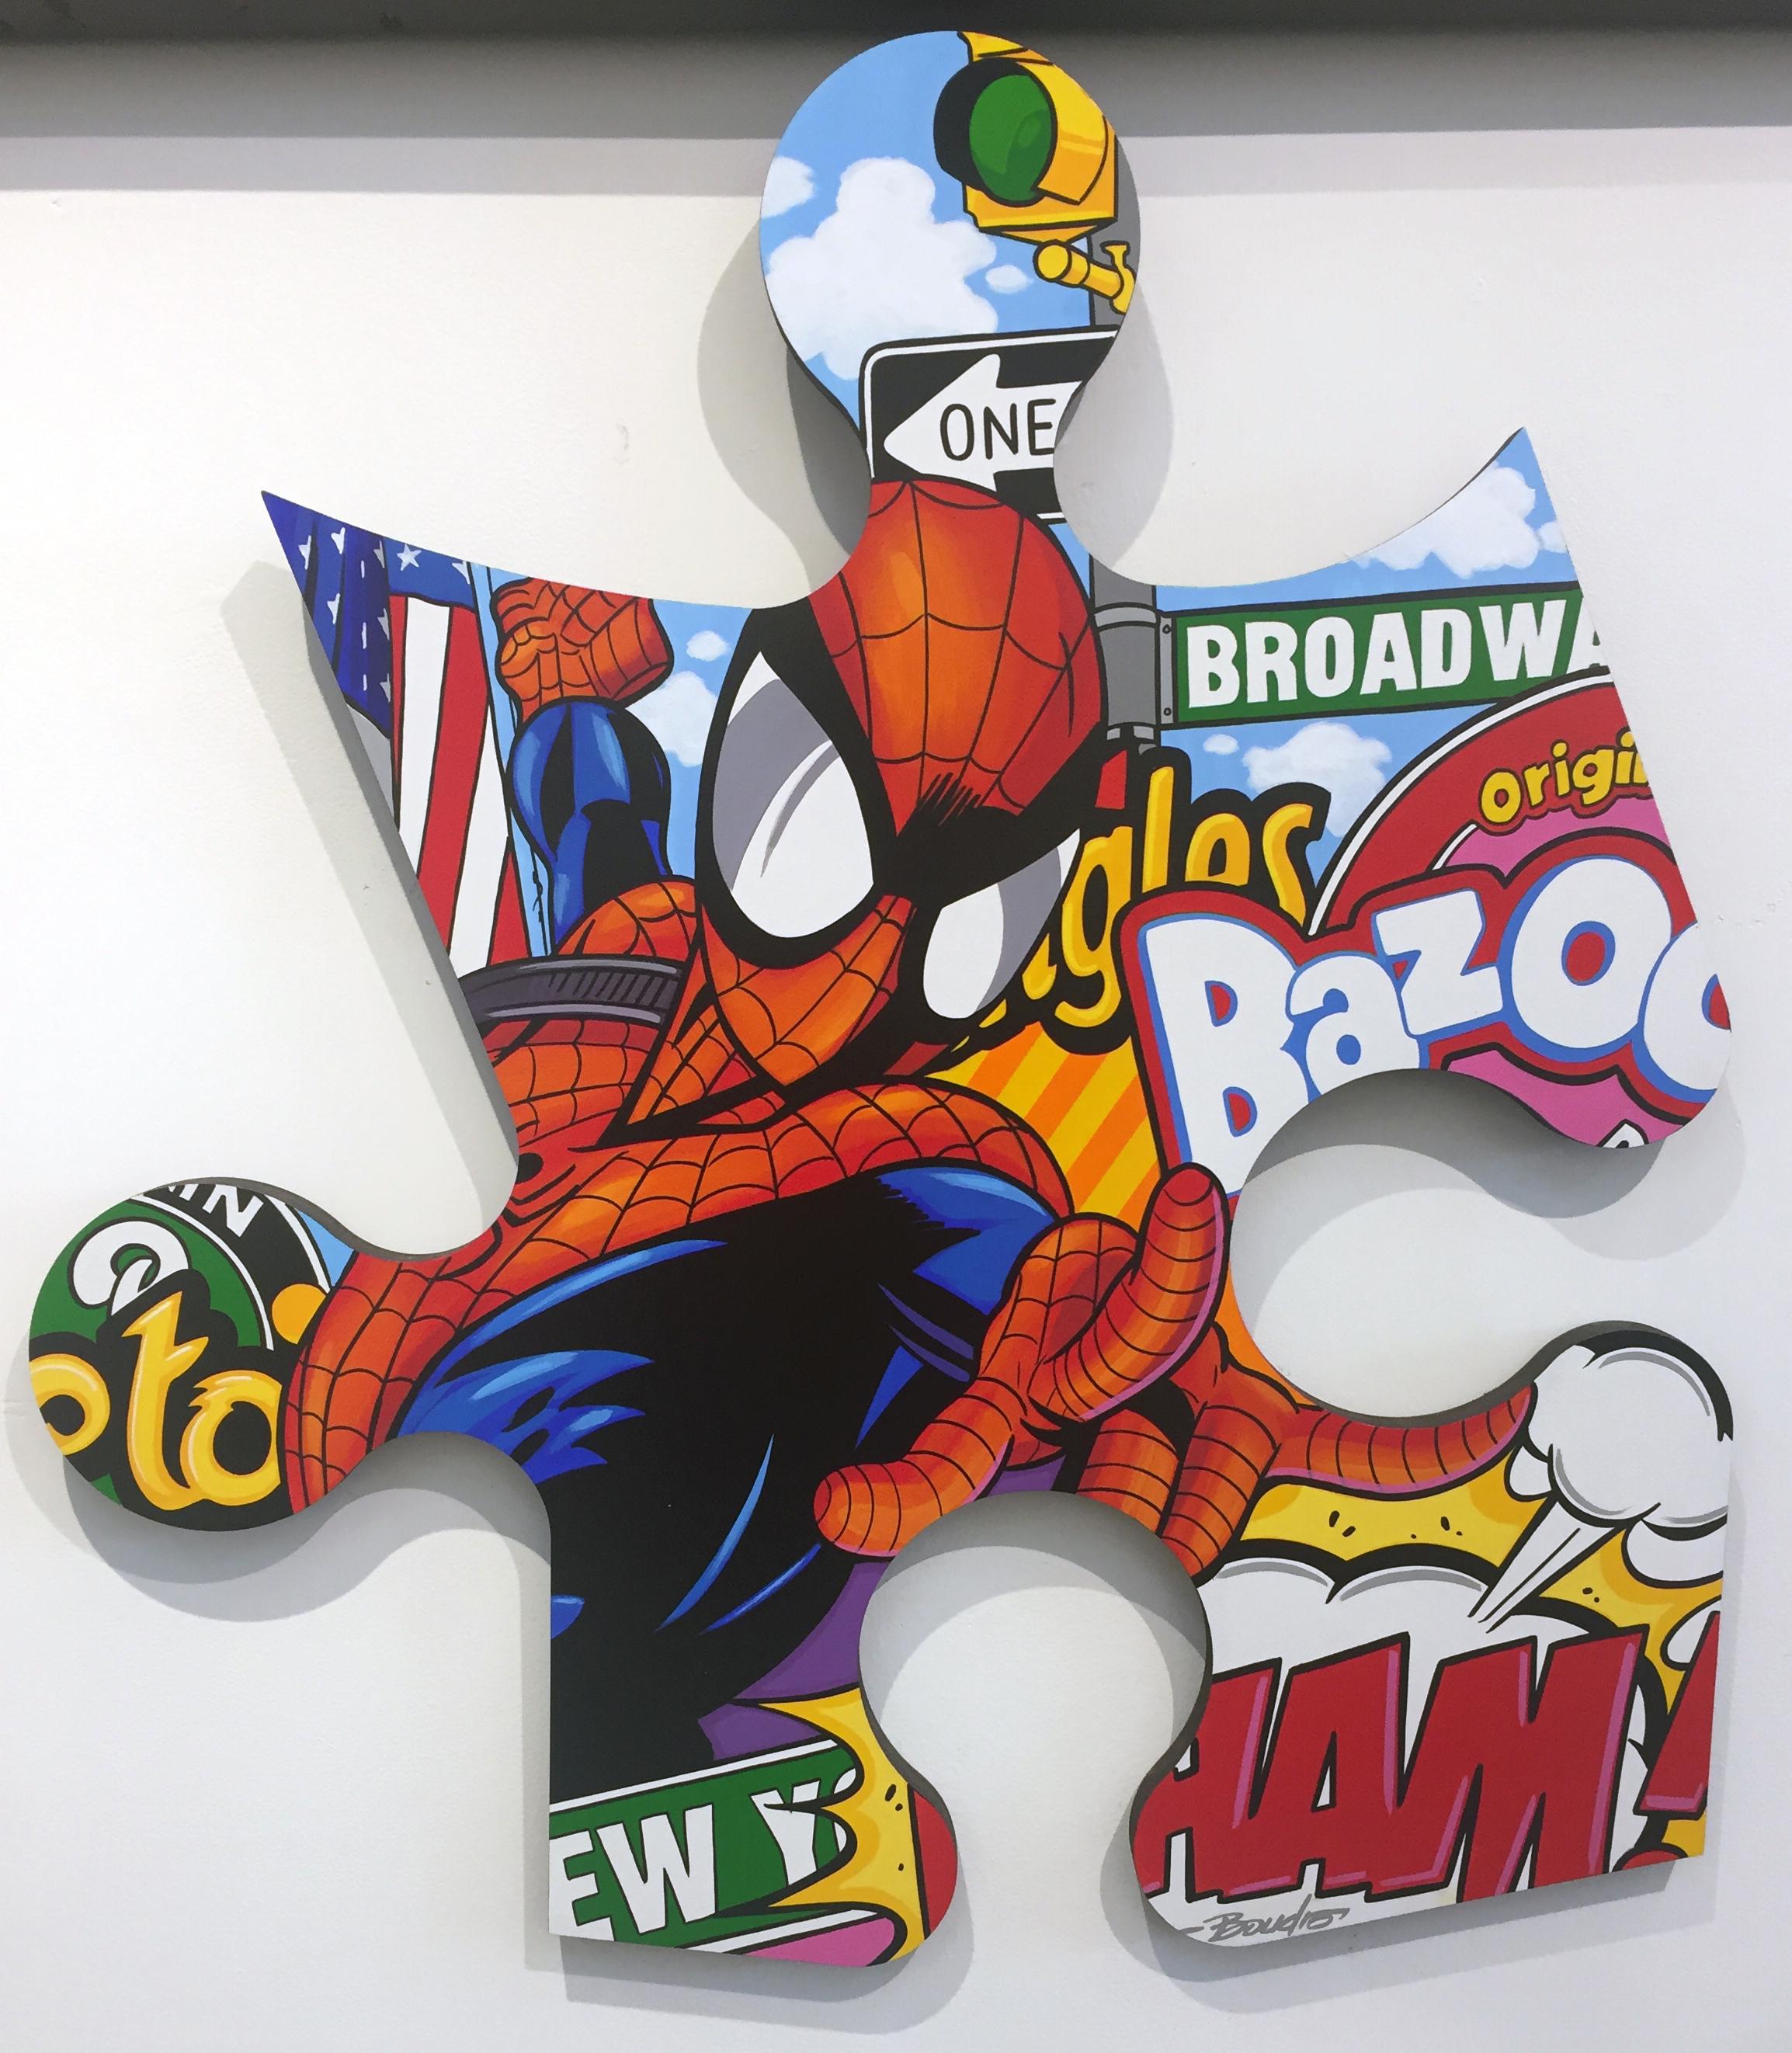 Spiderman - Green Light & Flag on Broadway